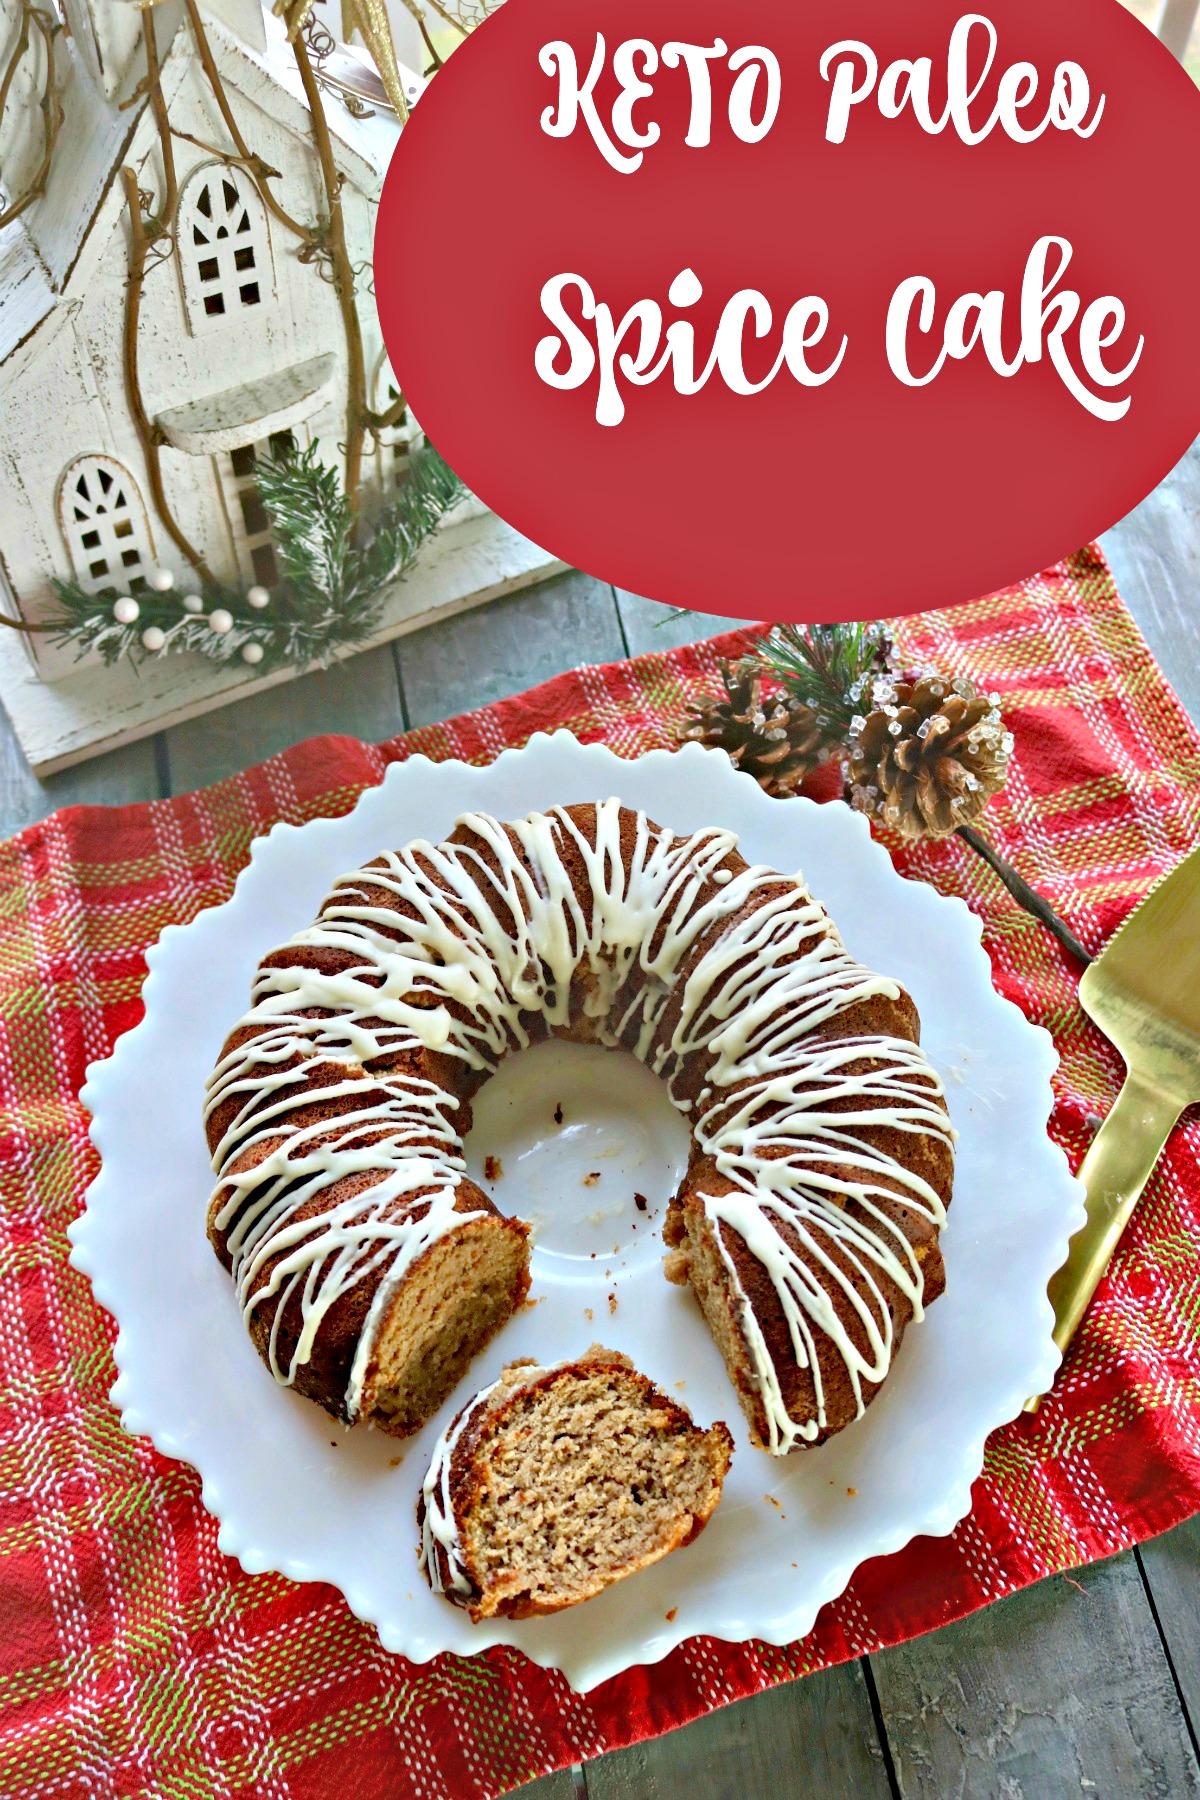 Keto Spice Cake made with almond flour, and various spices, swerve sweetener and cream cheese glaze. #ketobundtcake #ketospicecake #diabeticcake #spinachtiger #ketocreamcheeseglaze #ketoglaze #spinachtiger #glutenfreecake via @angelaroberts